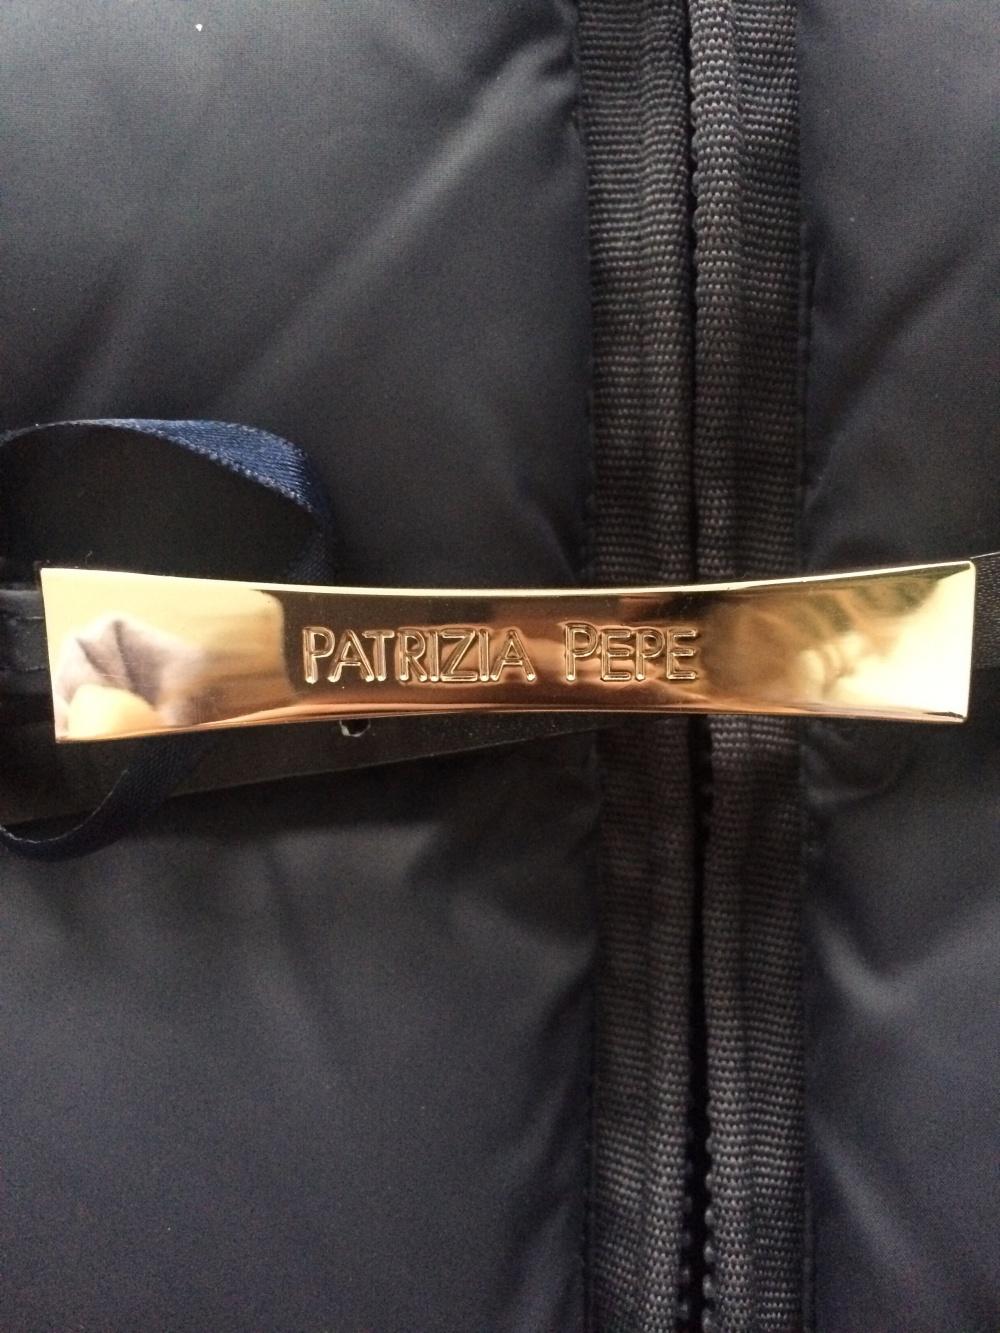 Пуховик Patricia Pepe, S